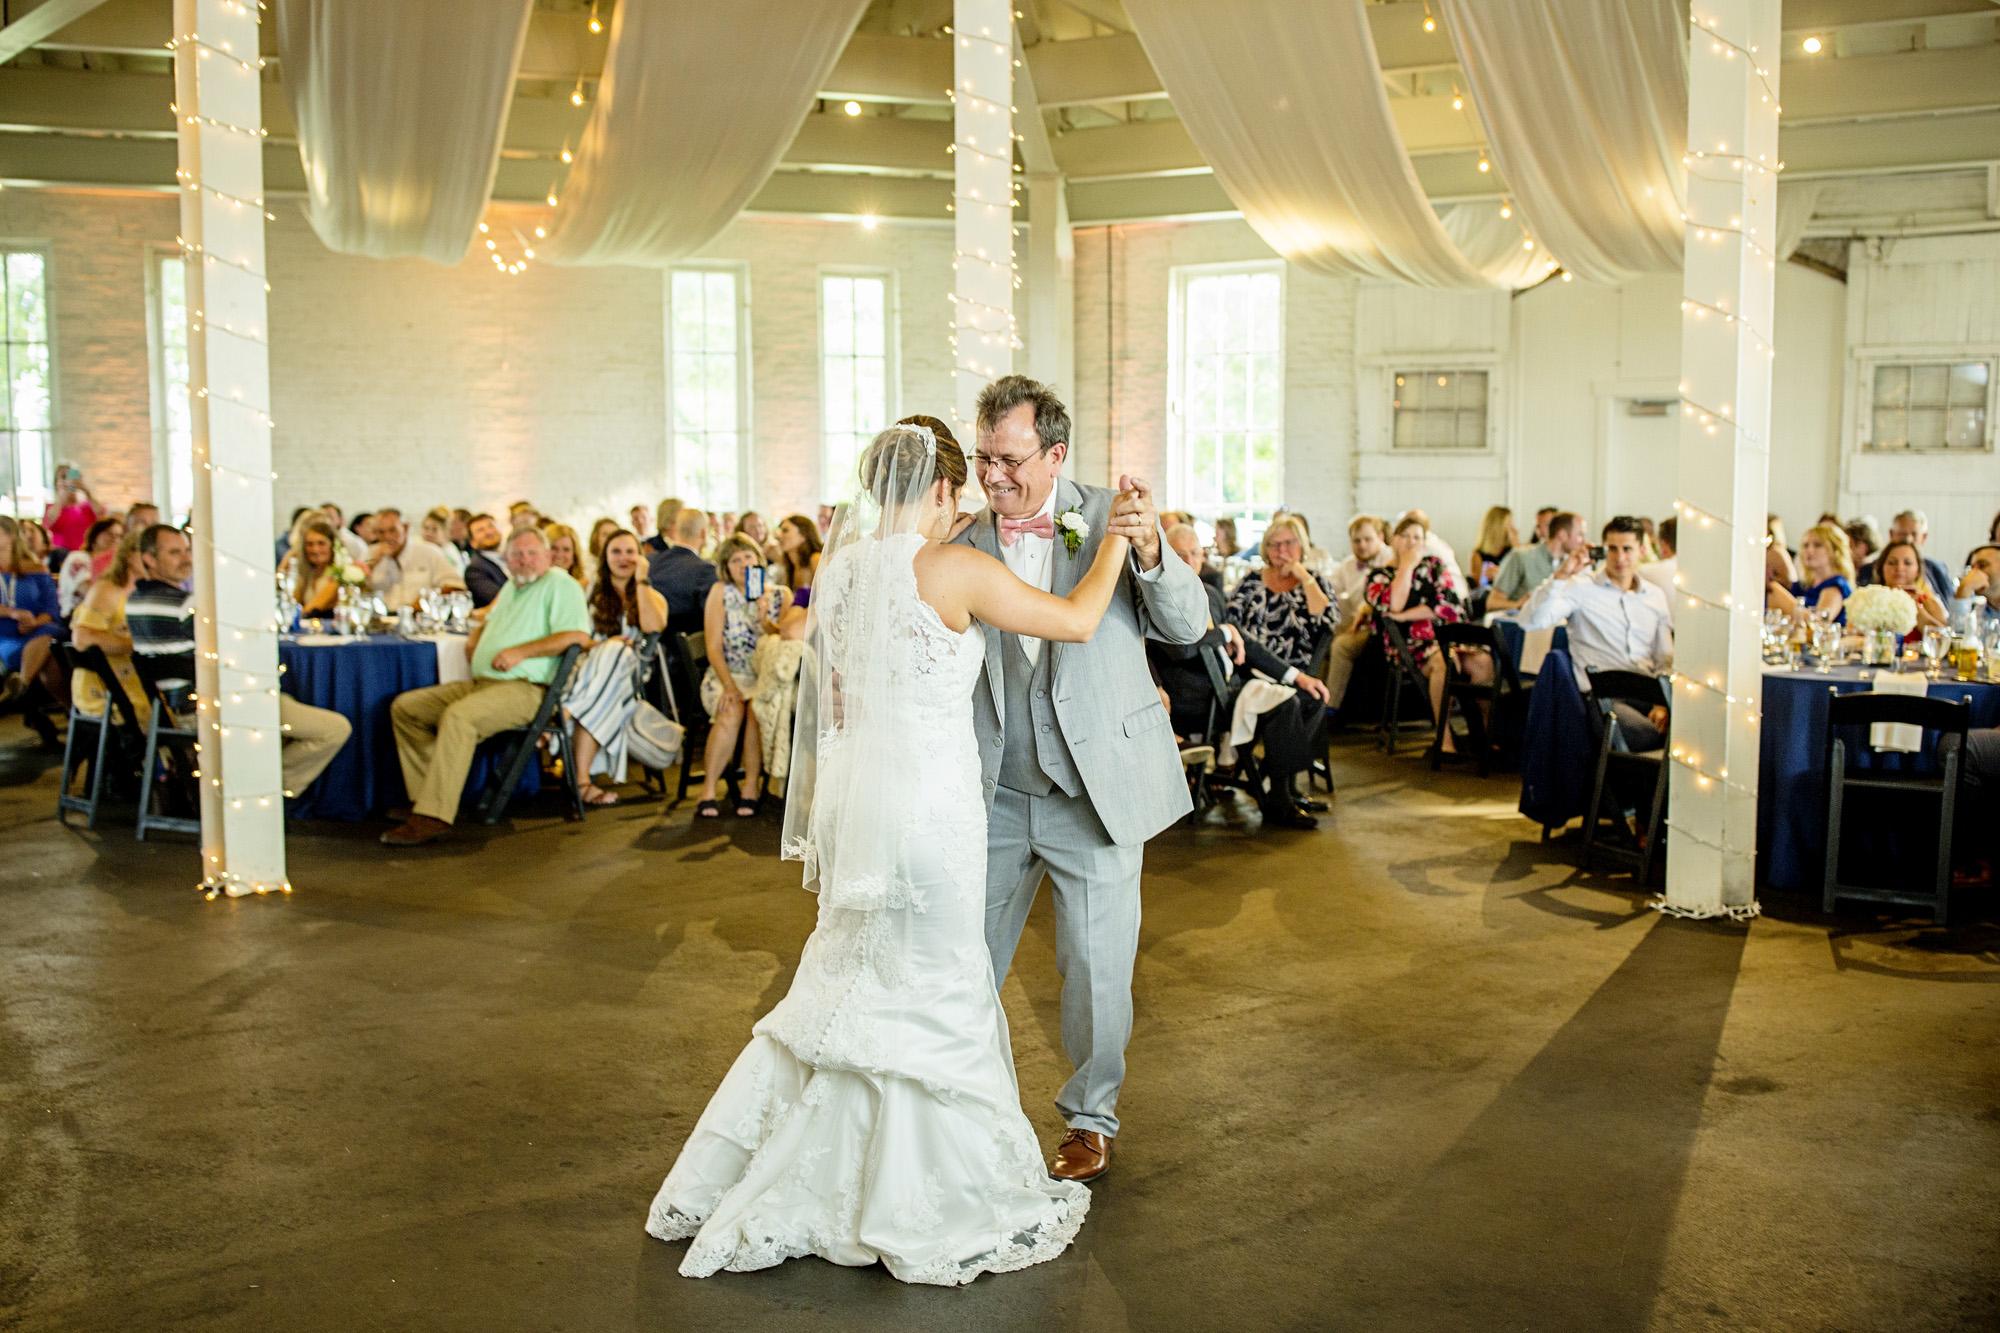 Seriously_Sabrina_Photography_Lexington_Kentucky_Round_Barn_Red_Mile_Stable_of_Memories_Wedding_Hart_101.jpg